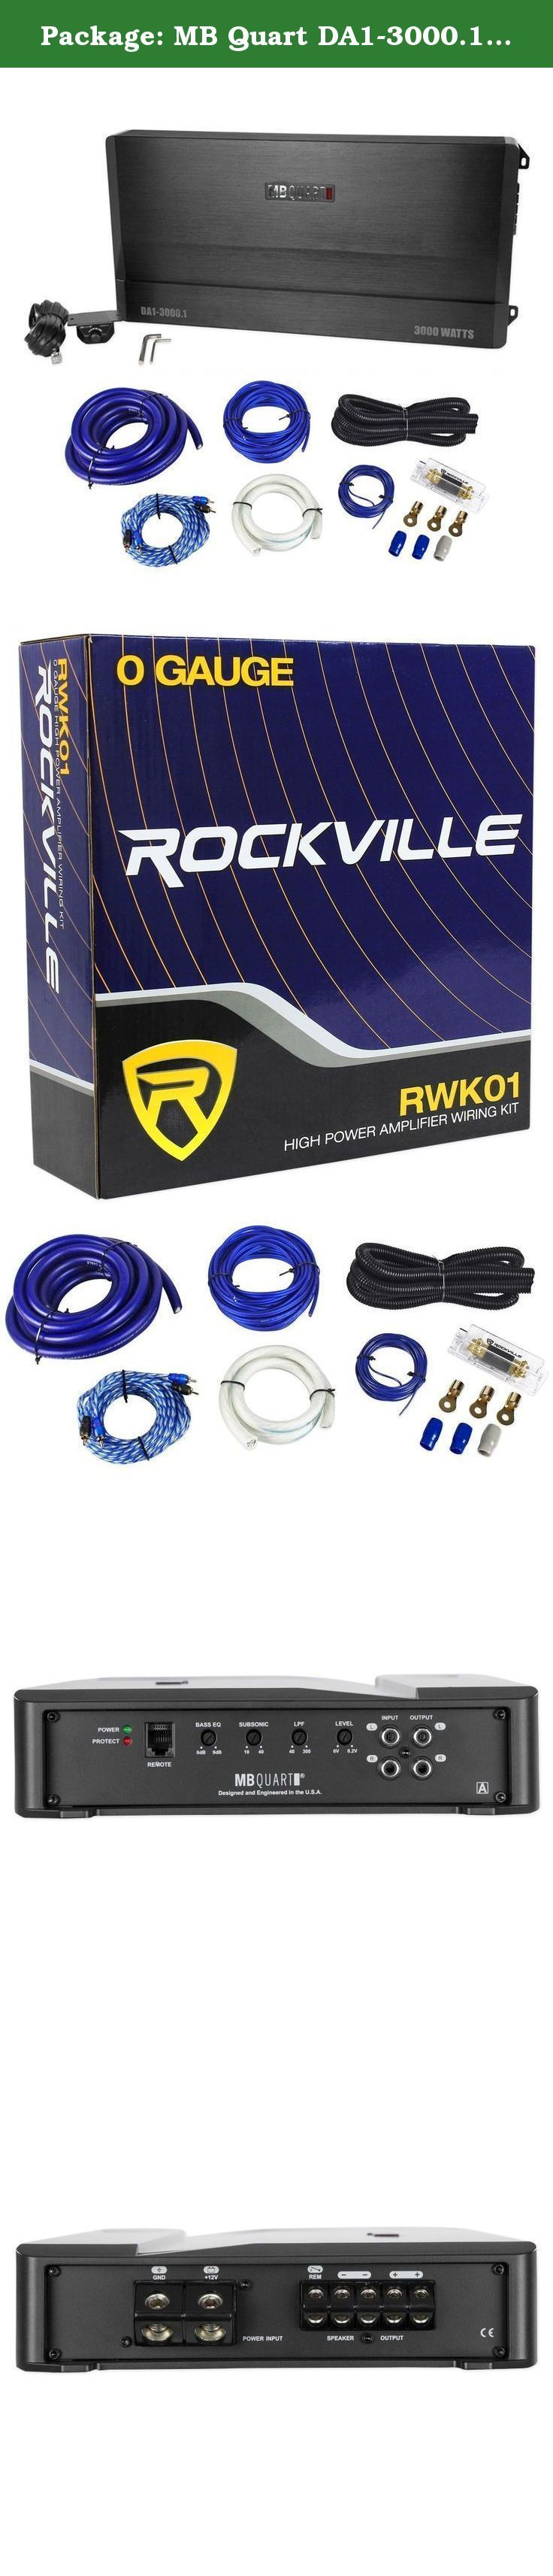 Package: MB Quart DA1-3000.1 3000 Watt RMS Mono Class D Car Audio Amplifier With Bass Remote + Rockville RWK01 0 Gauge Complete Car Amplifier Installation Kit with RCA Cables. Features: MB Quart DA1-3000.1 3000 Watt RMS Mono Class D Car Audio Amplifier Power Output: 3000 Watts x 1 Channel @ 1 ohms Power Output: 1500 Watts x 1 Channel @ 2 ohms Power Output: 750 Watts x 1 Channel @ 4 ohms Frequency Response: 10Hz-300Hz Signal to Noise Ratio: >95dB Bass Boost 0-12dB RCA Input Rockville RWK01…